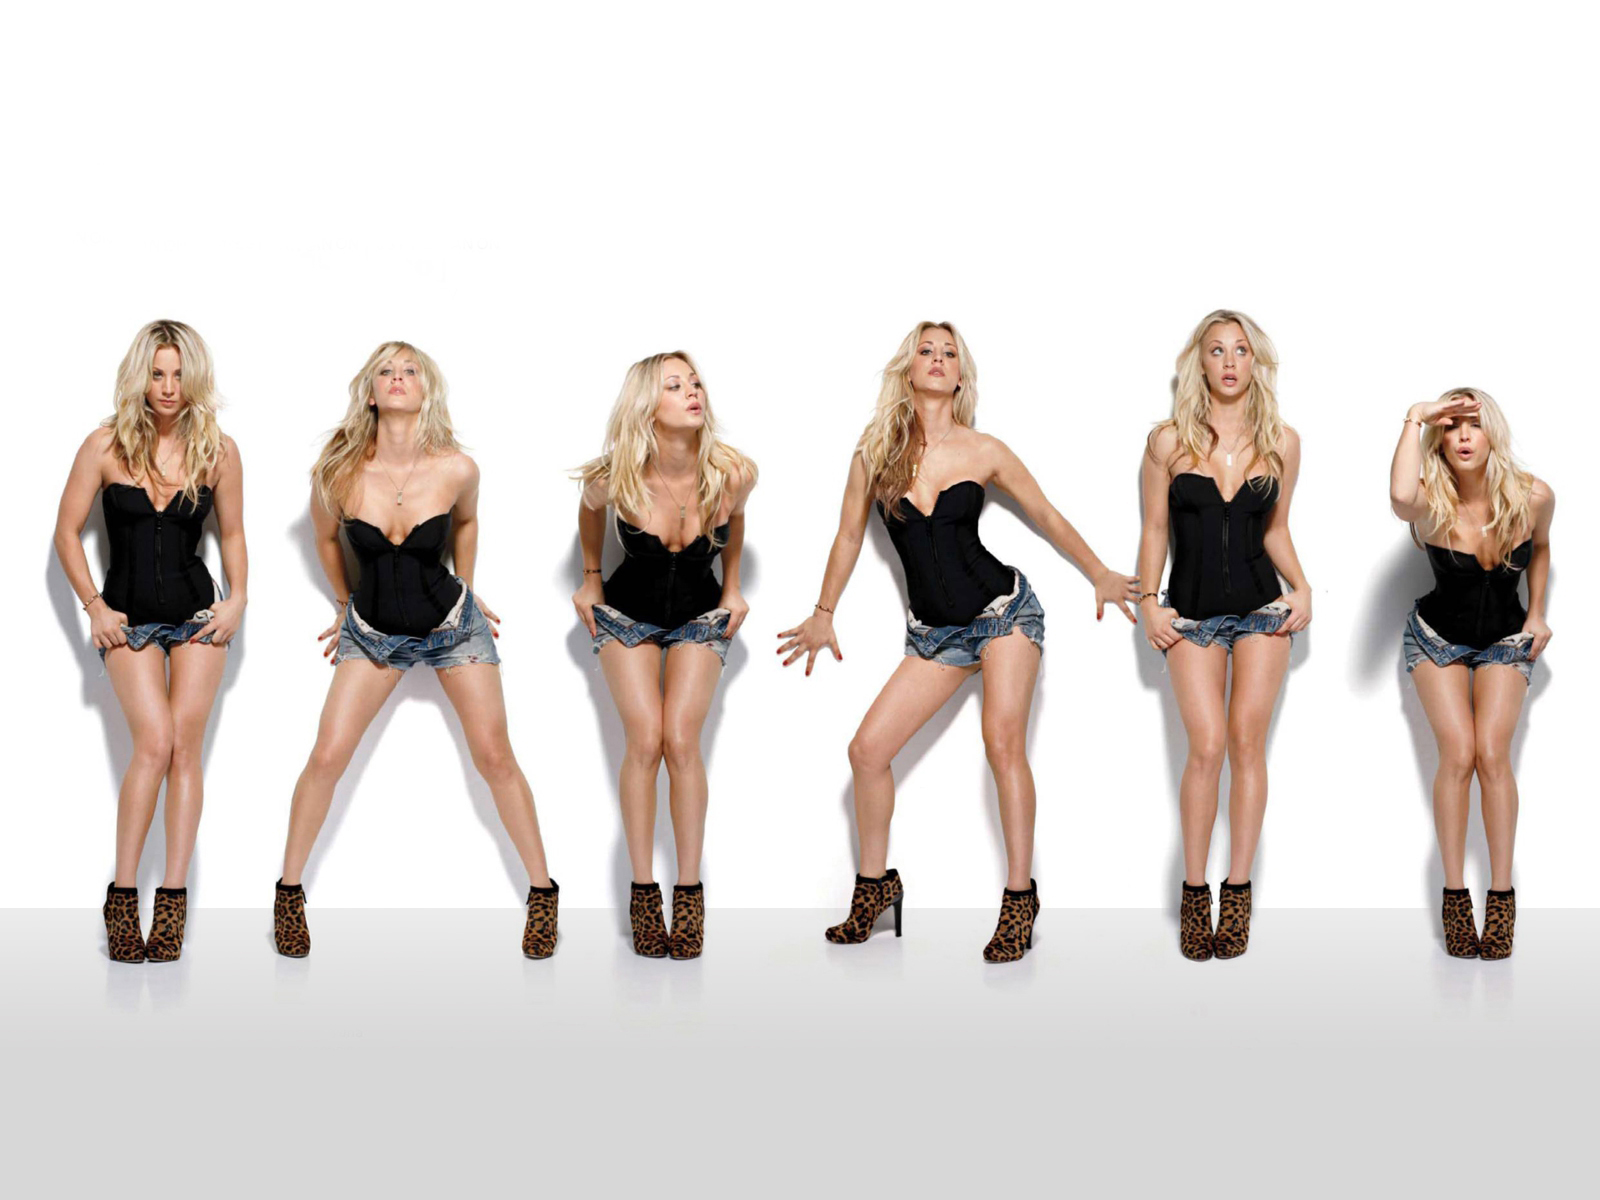 Caley Cuoco Penny Big Bang Theory HD Desktop Wallpaper